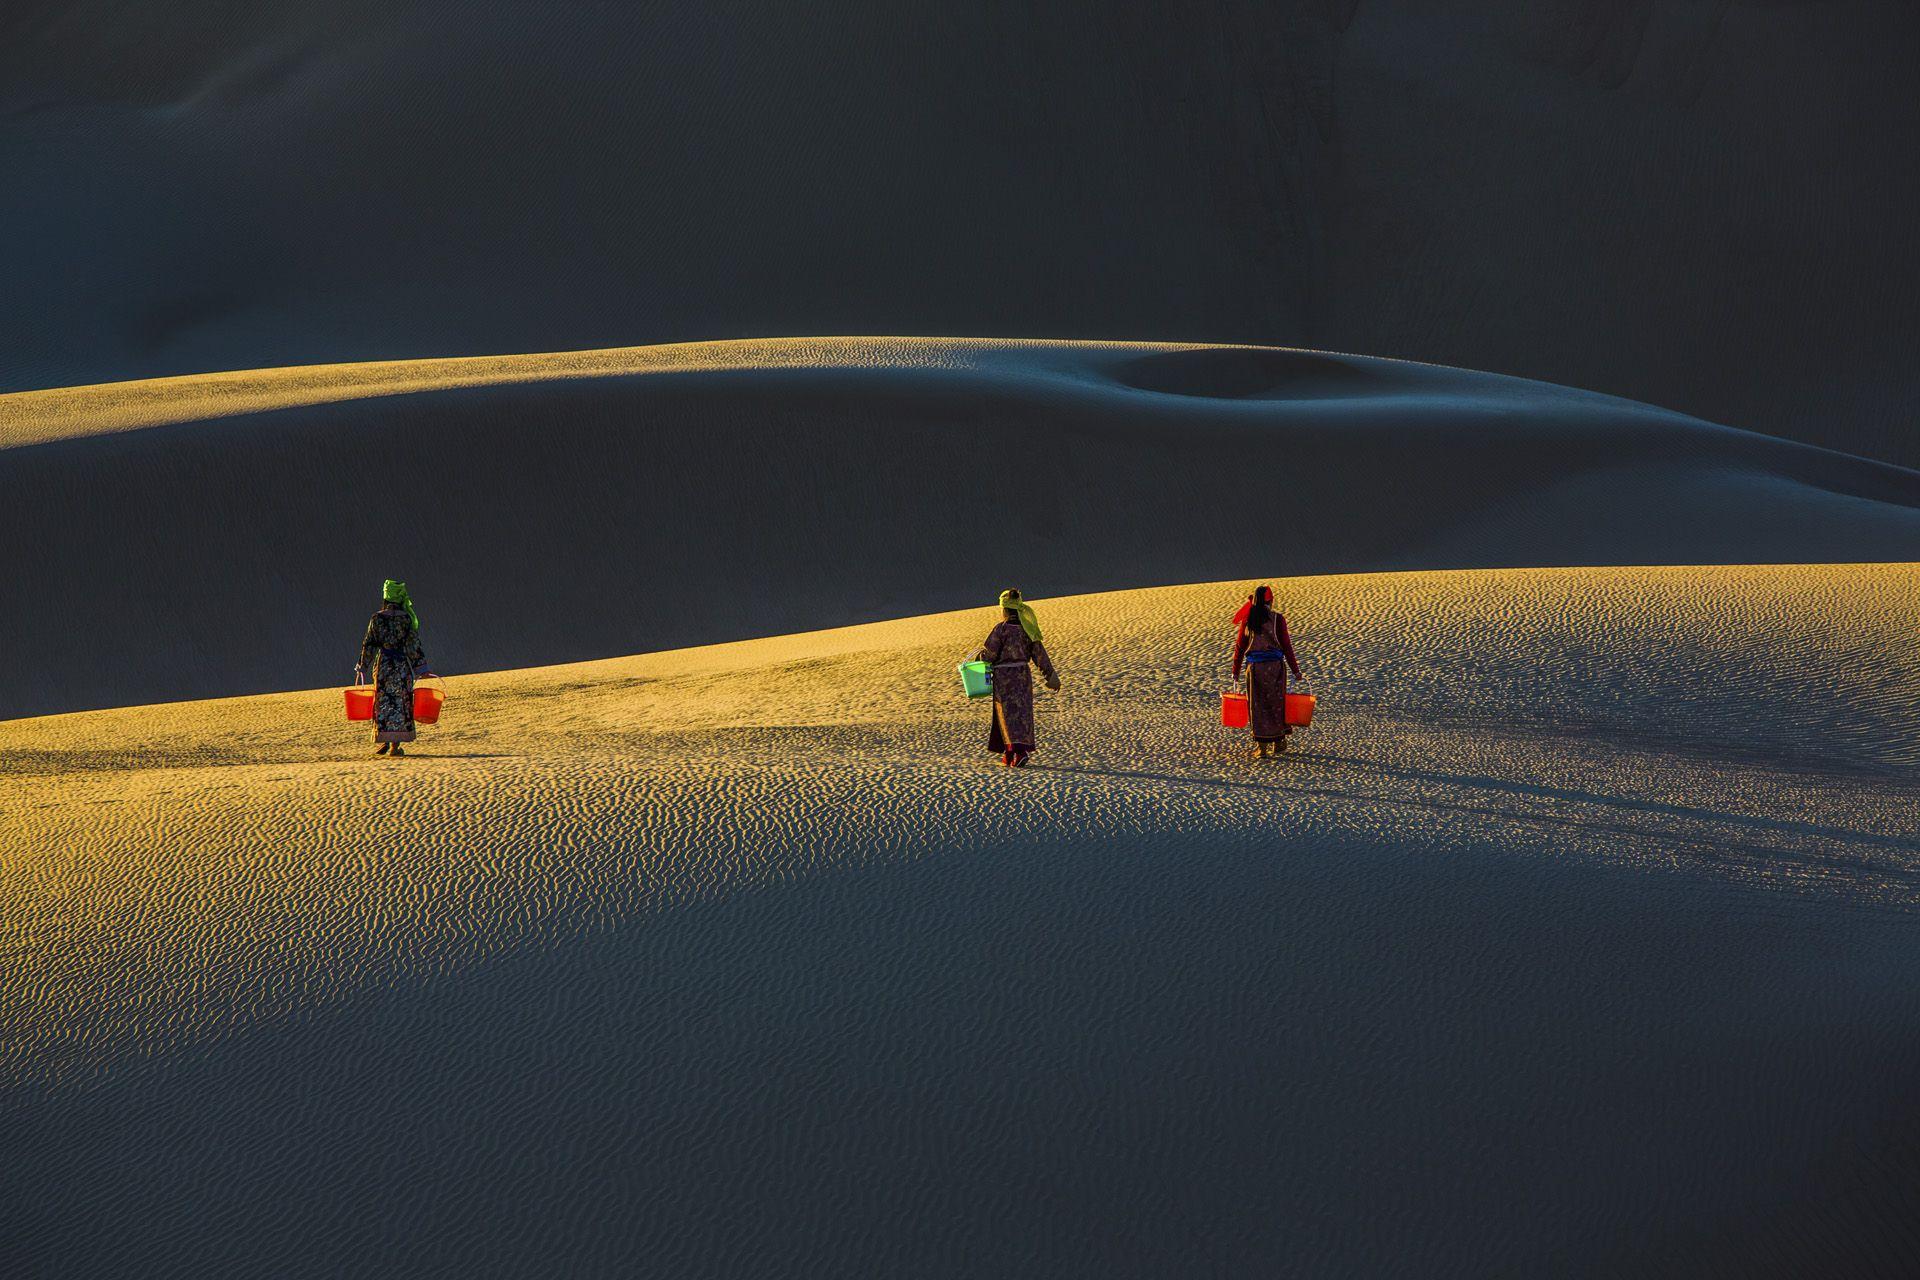 Sisters in desert